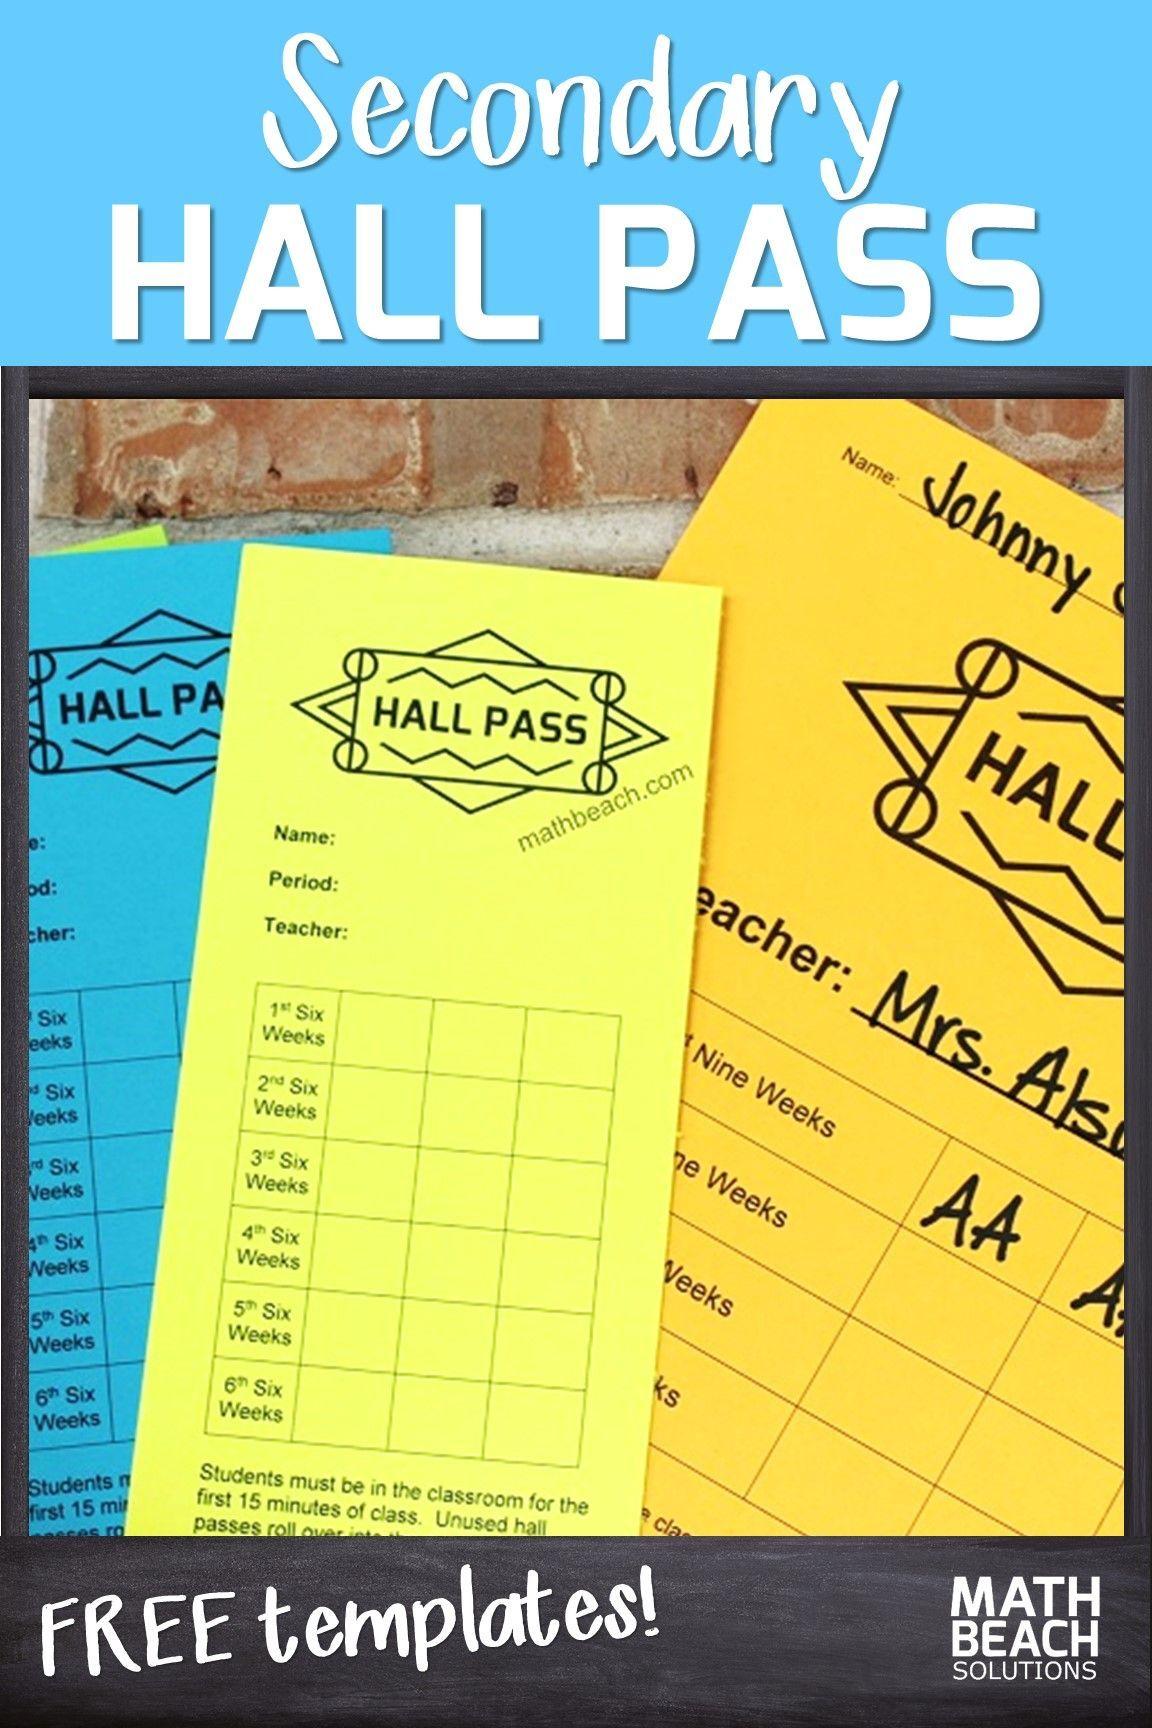 High School Hall Pass Classroom Procedures For High School Math